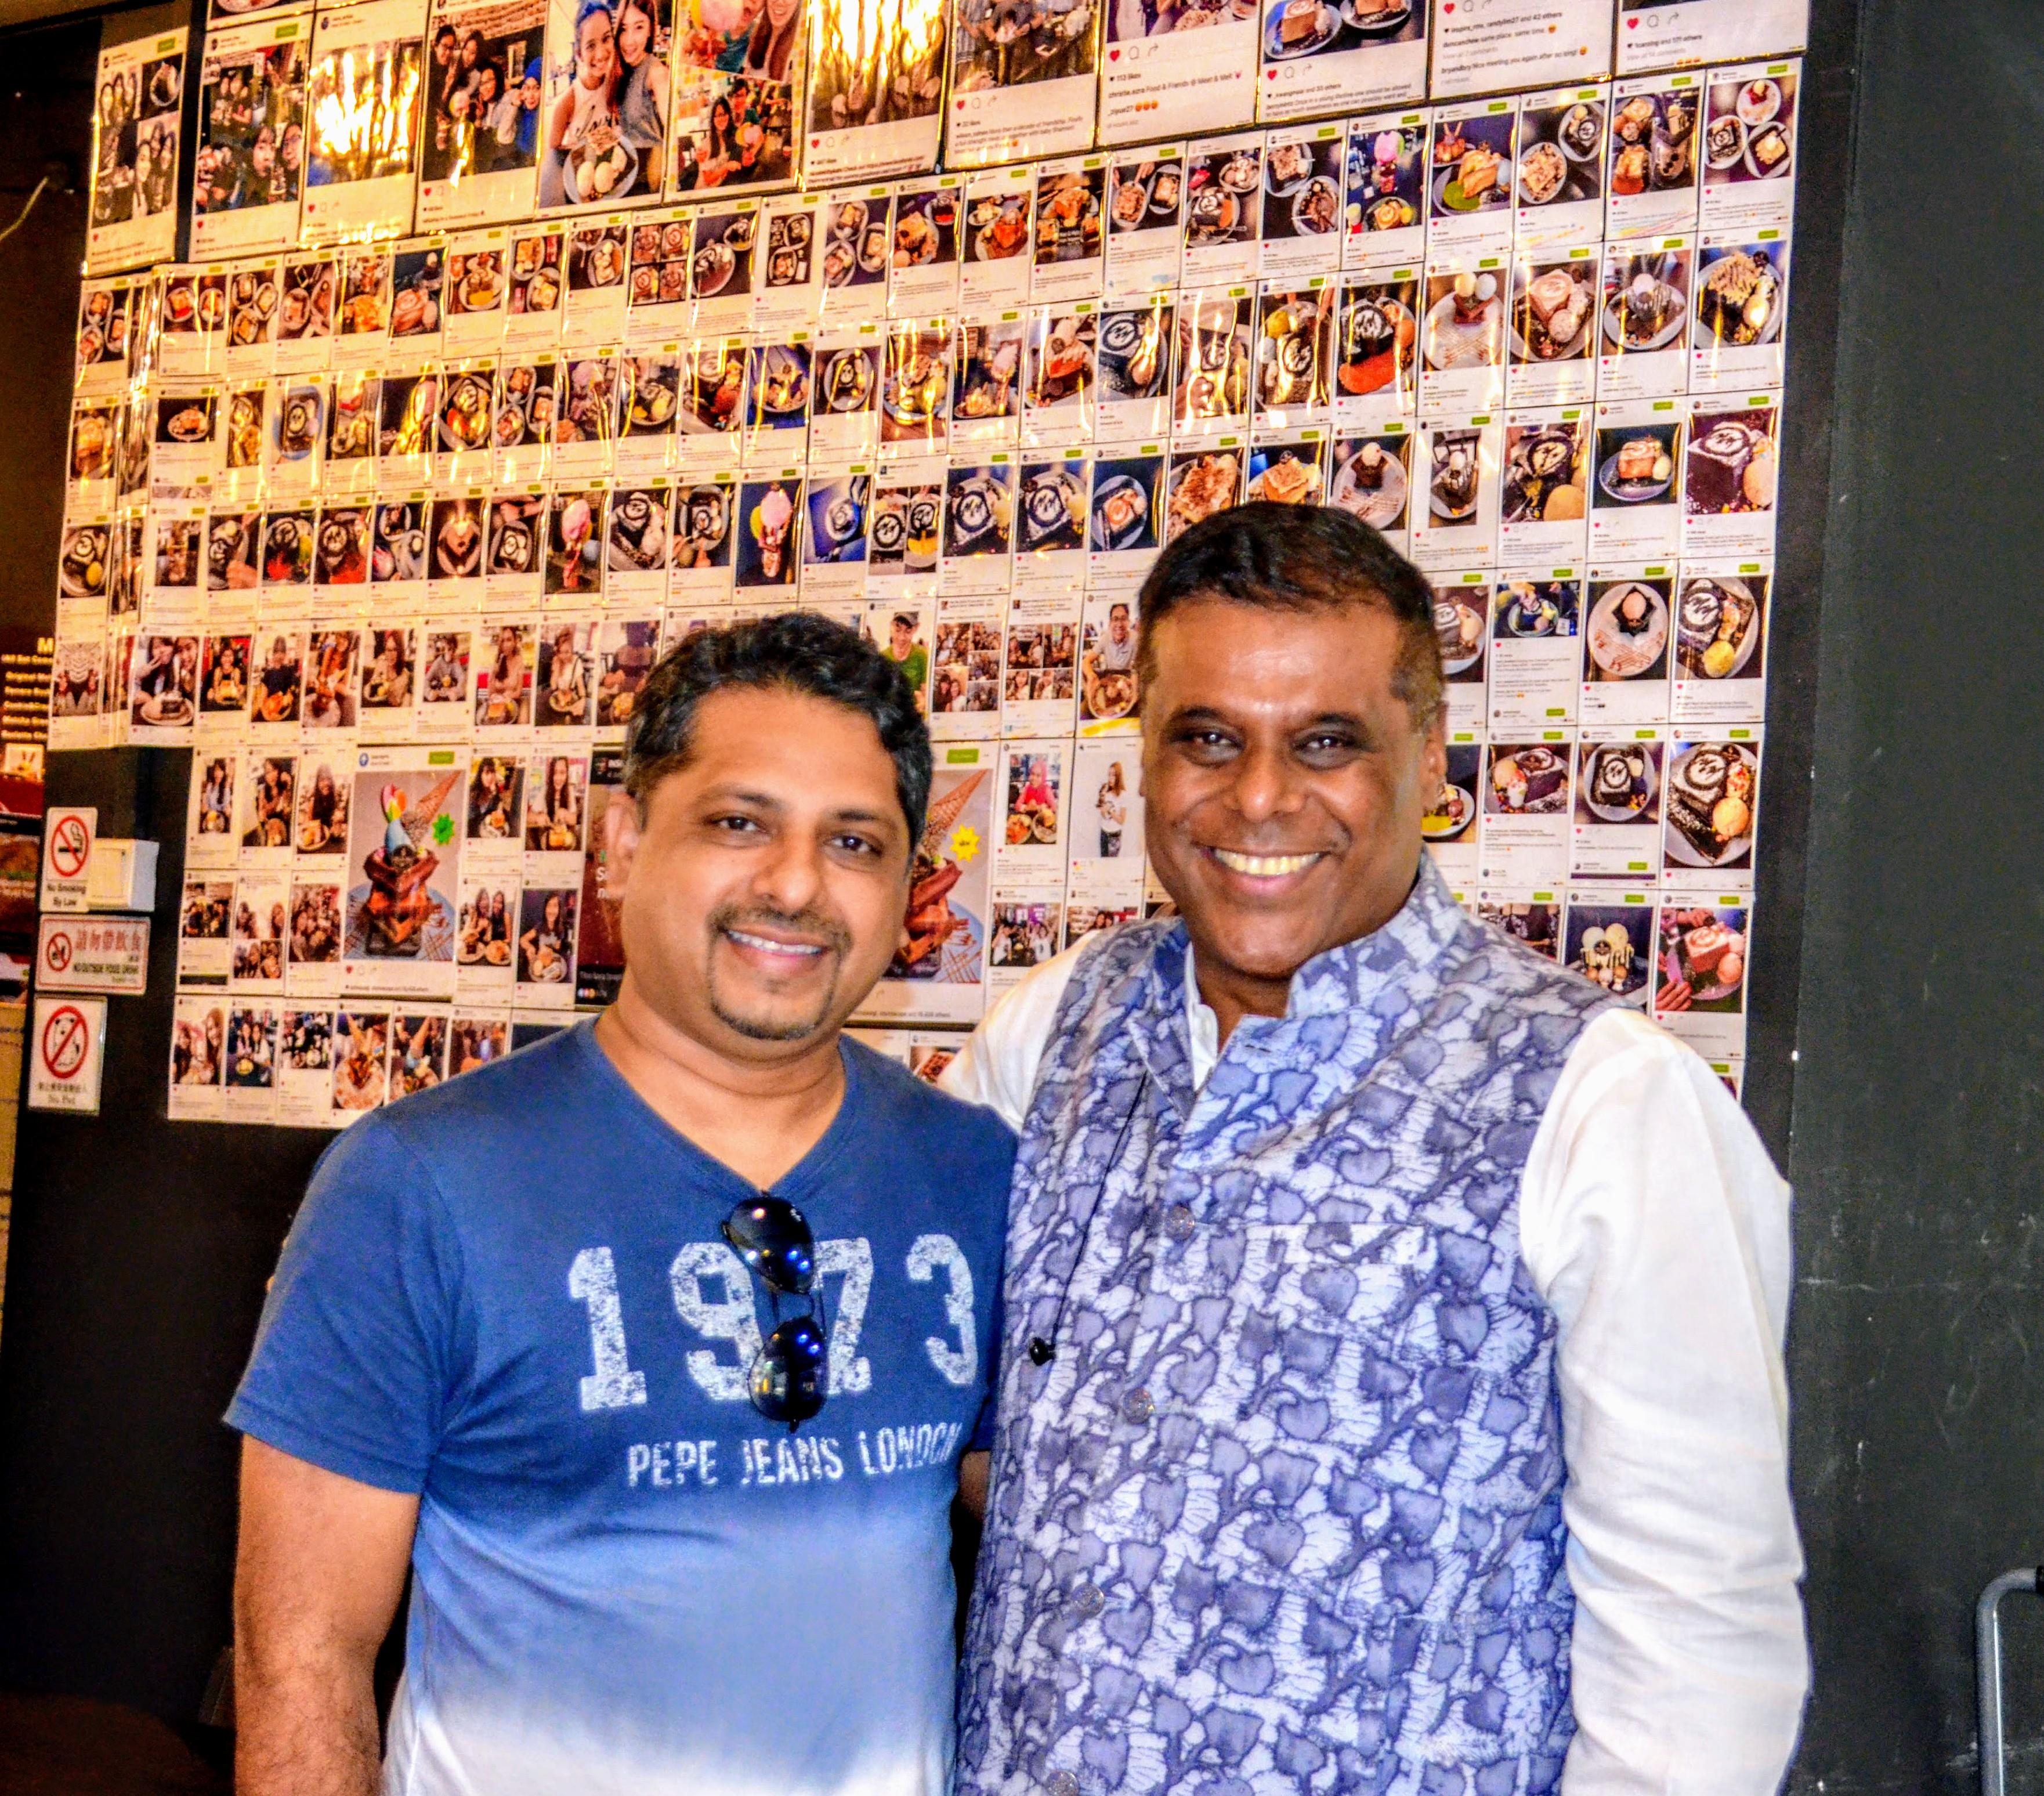 Ashish Vidyarthi with Filmwallas's founder and CEO, Zafar Anjum Photo: Connected to India